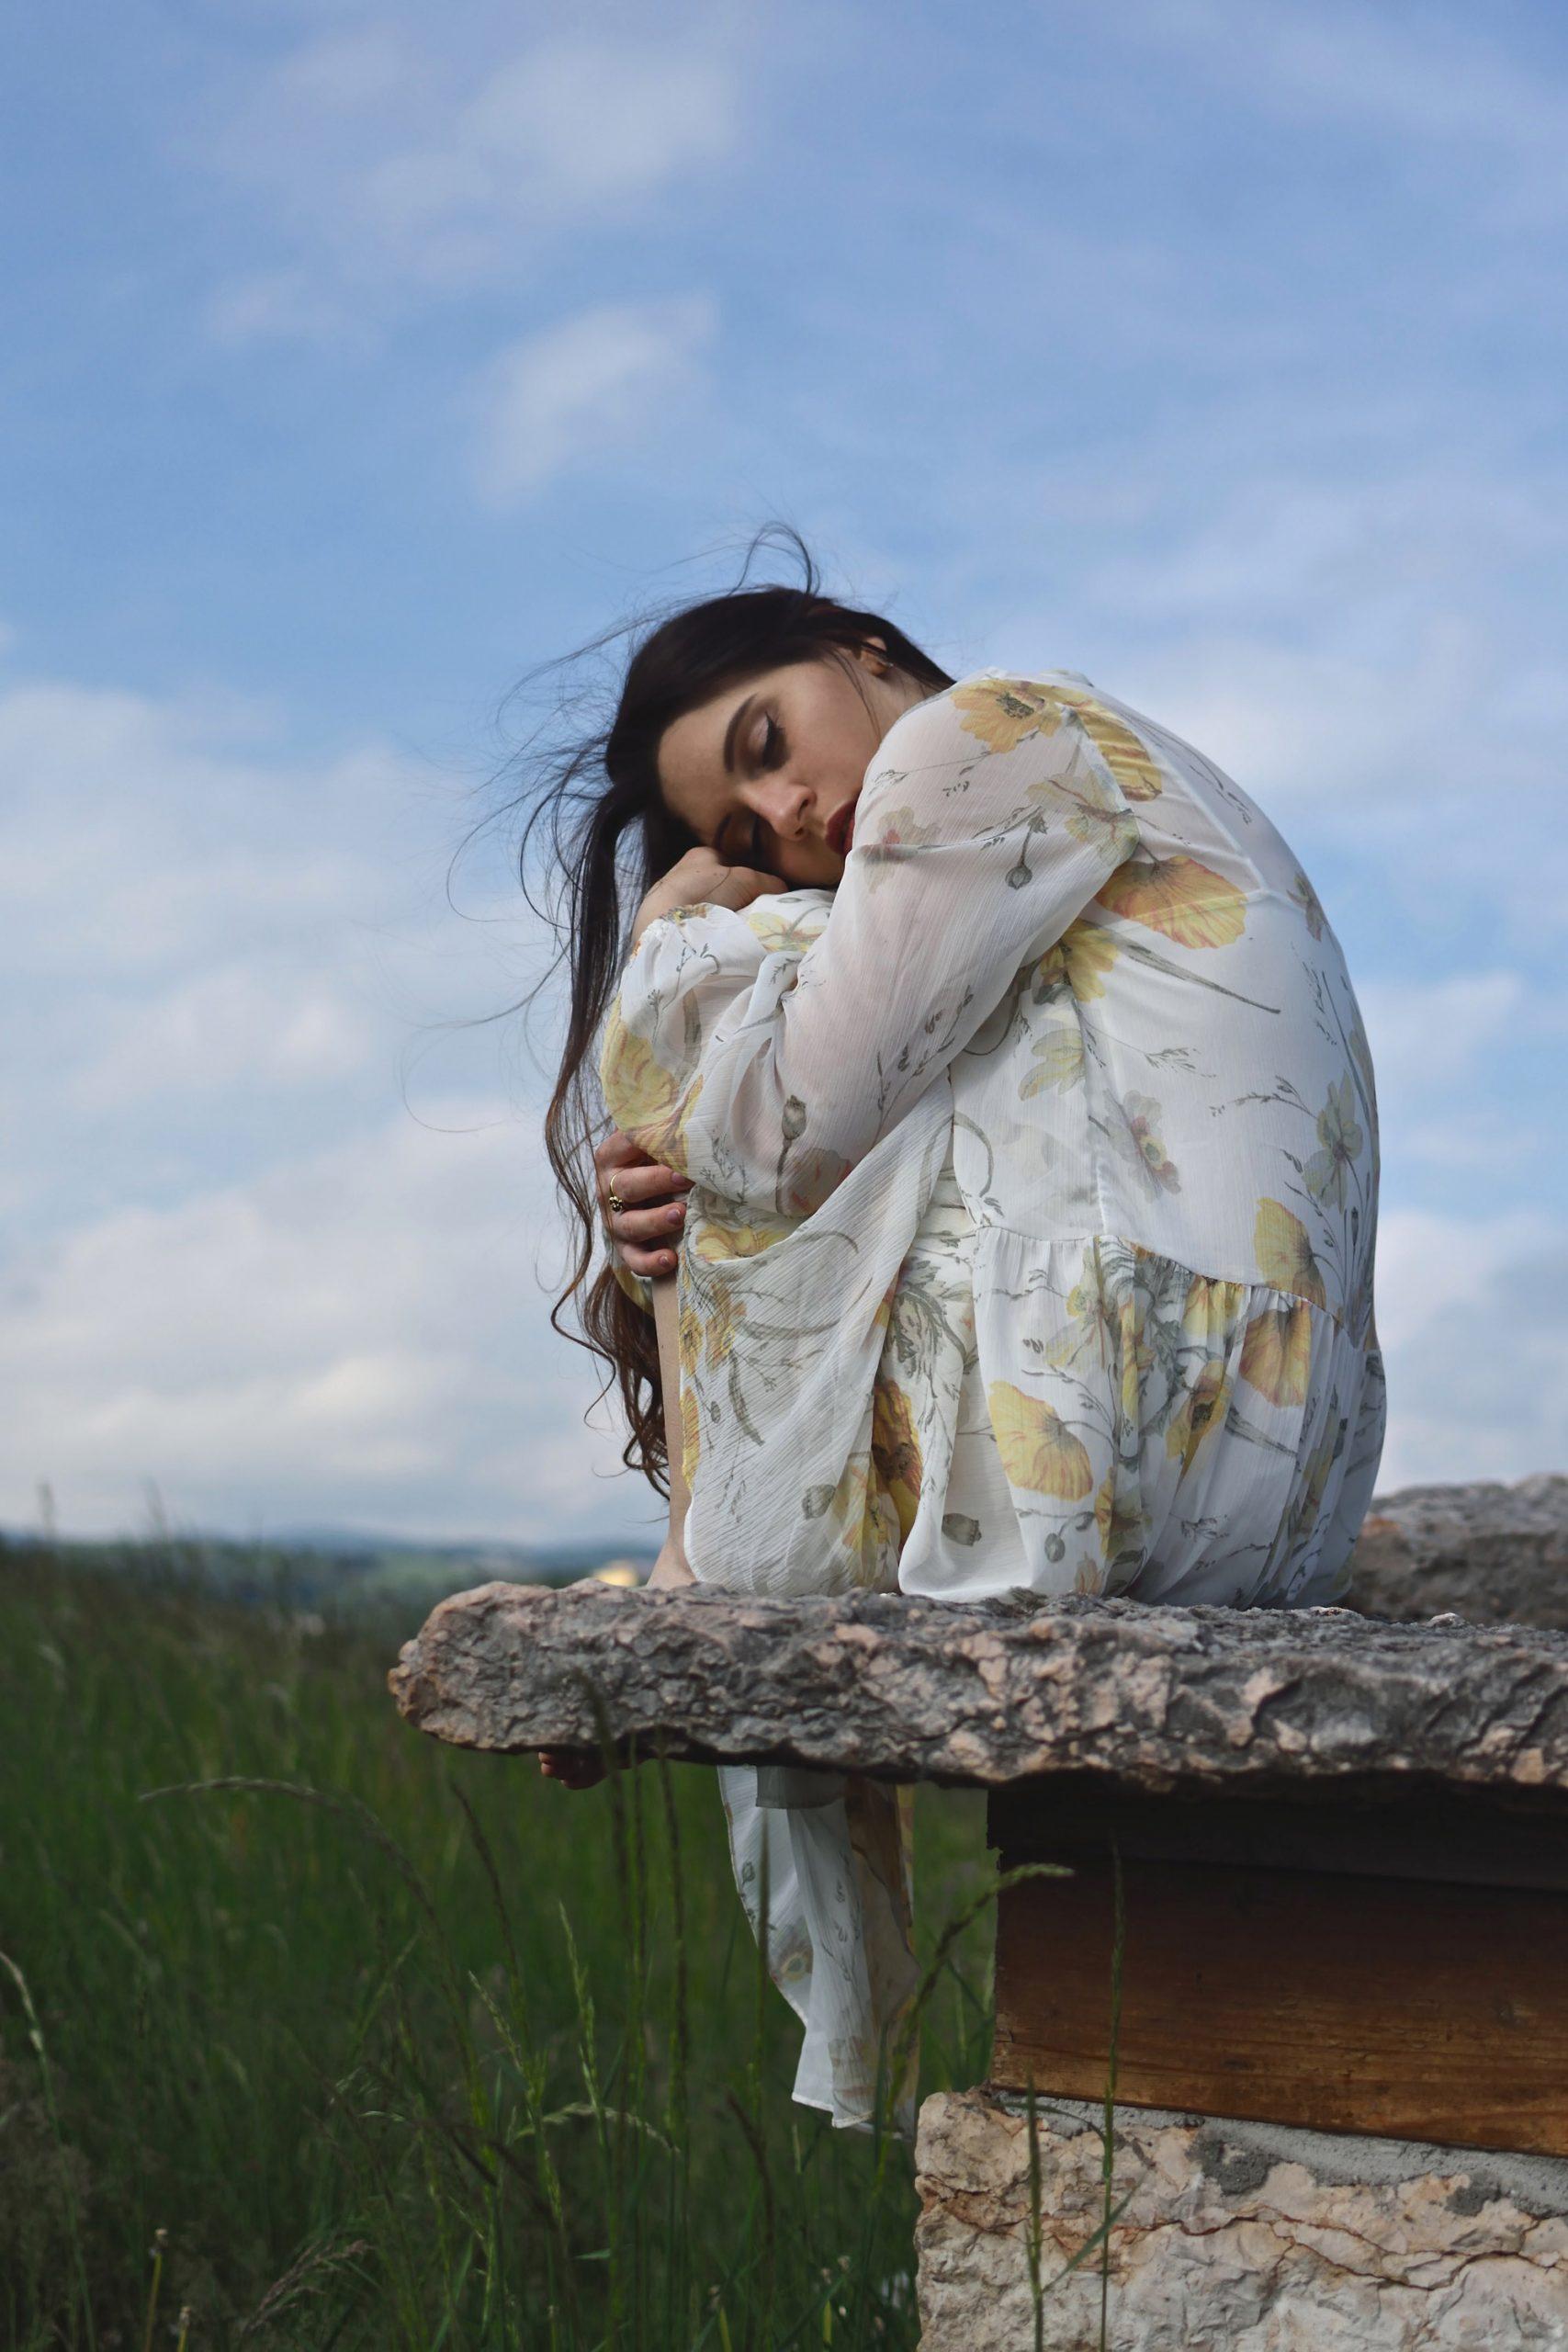 Categorie: Glamour, Portrait; Photographer: ROSY CARLETTI; Model: FRANCESCA DE BRACO; Location: Verona, VR, Italia